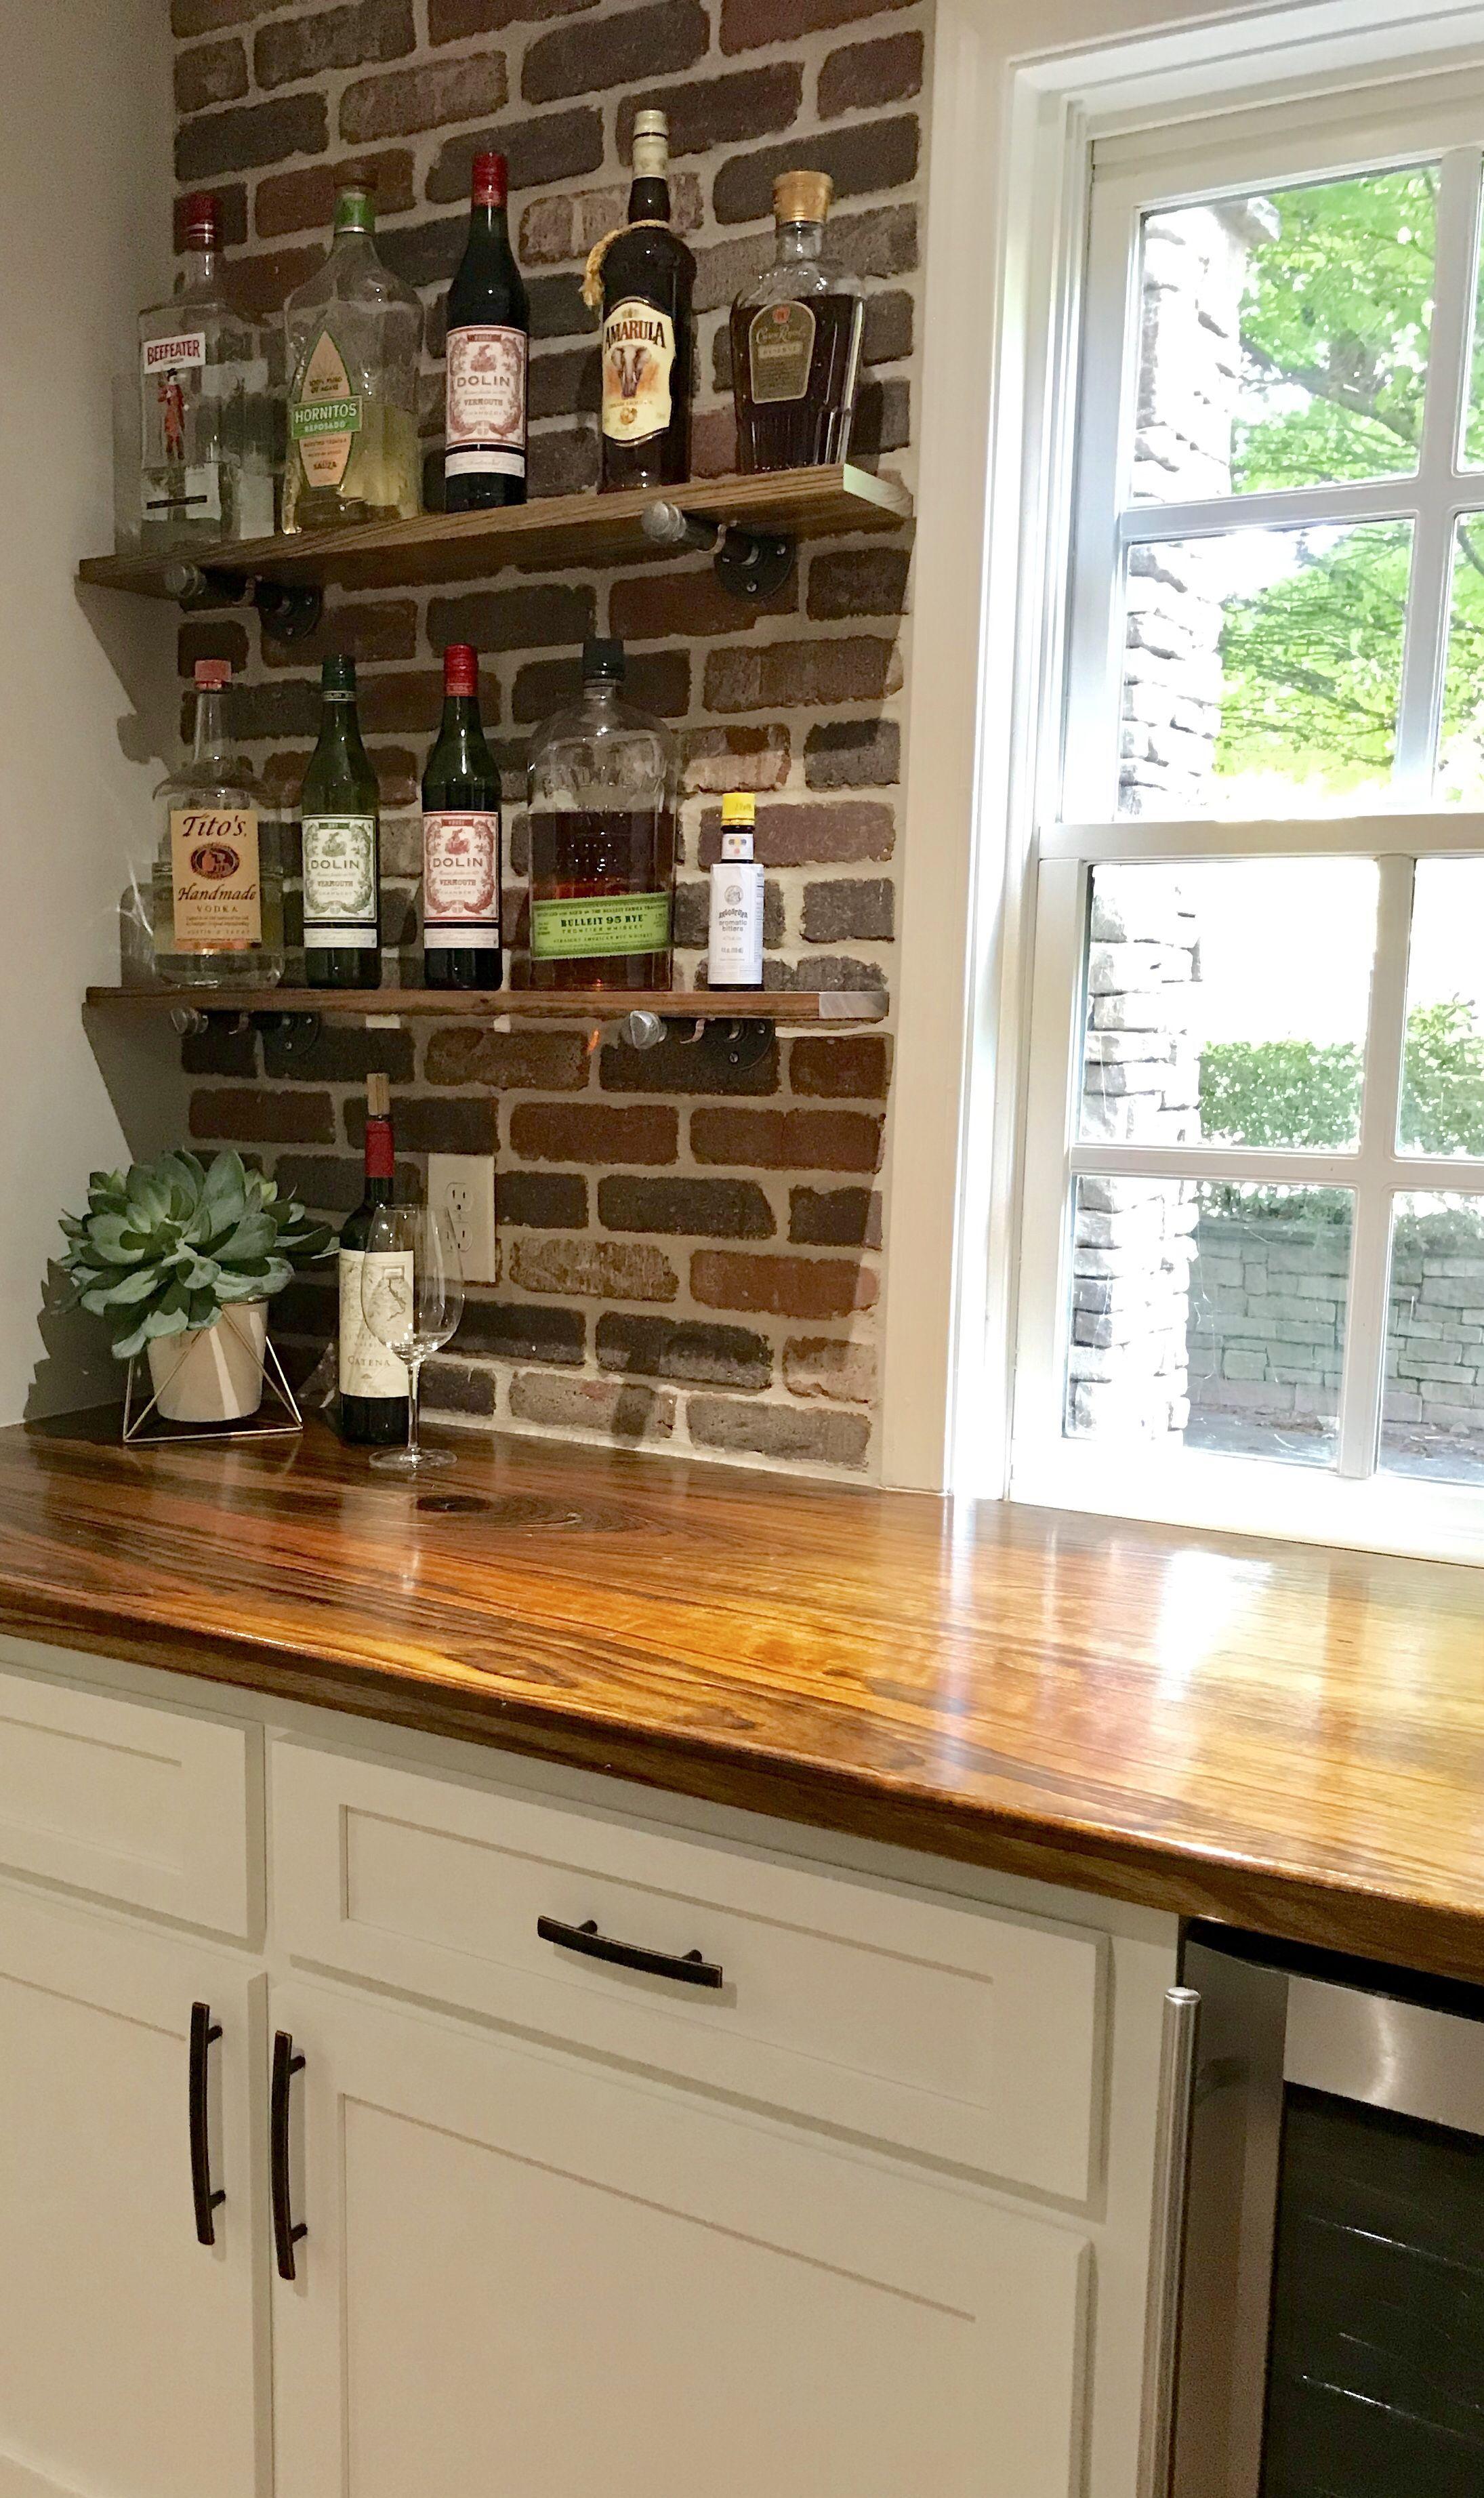 The Brick Backsplash And Custom Shedua Wood Countertop Made The